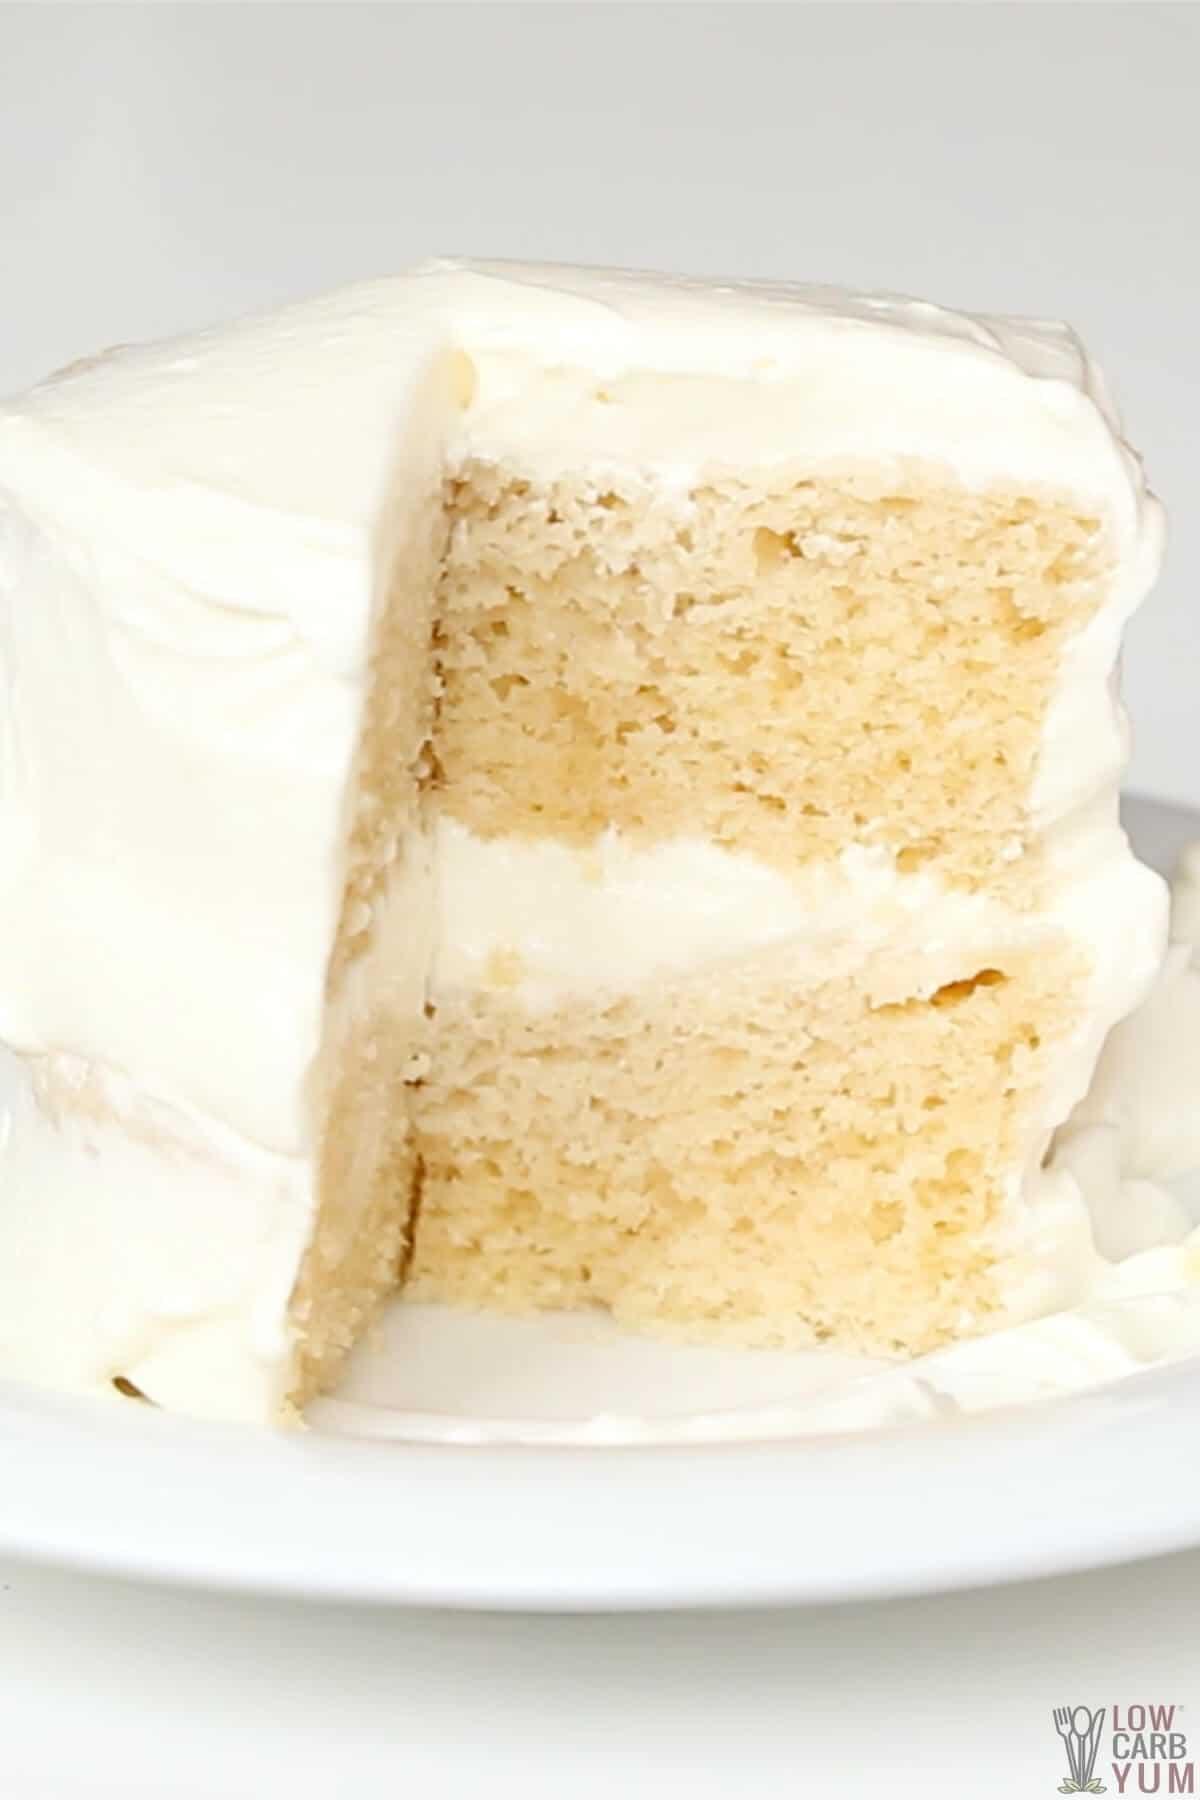 tall image showing inside of cut layered mug cake